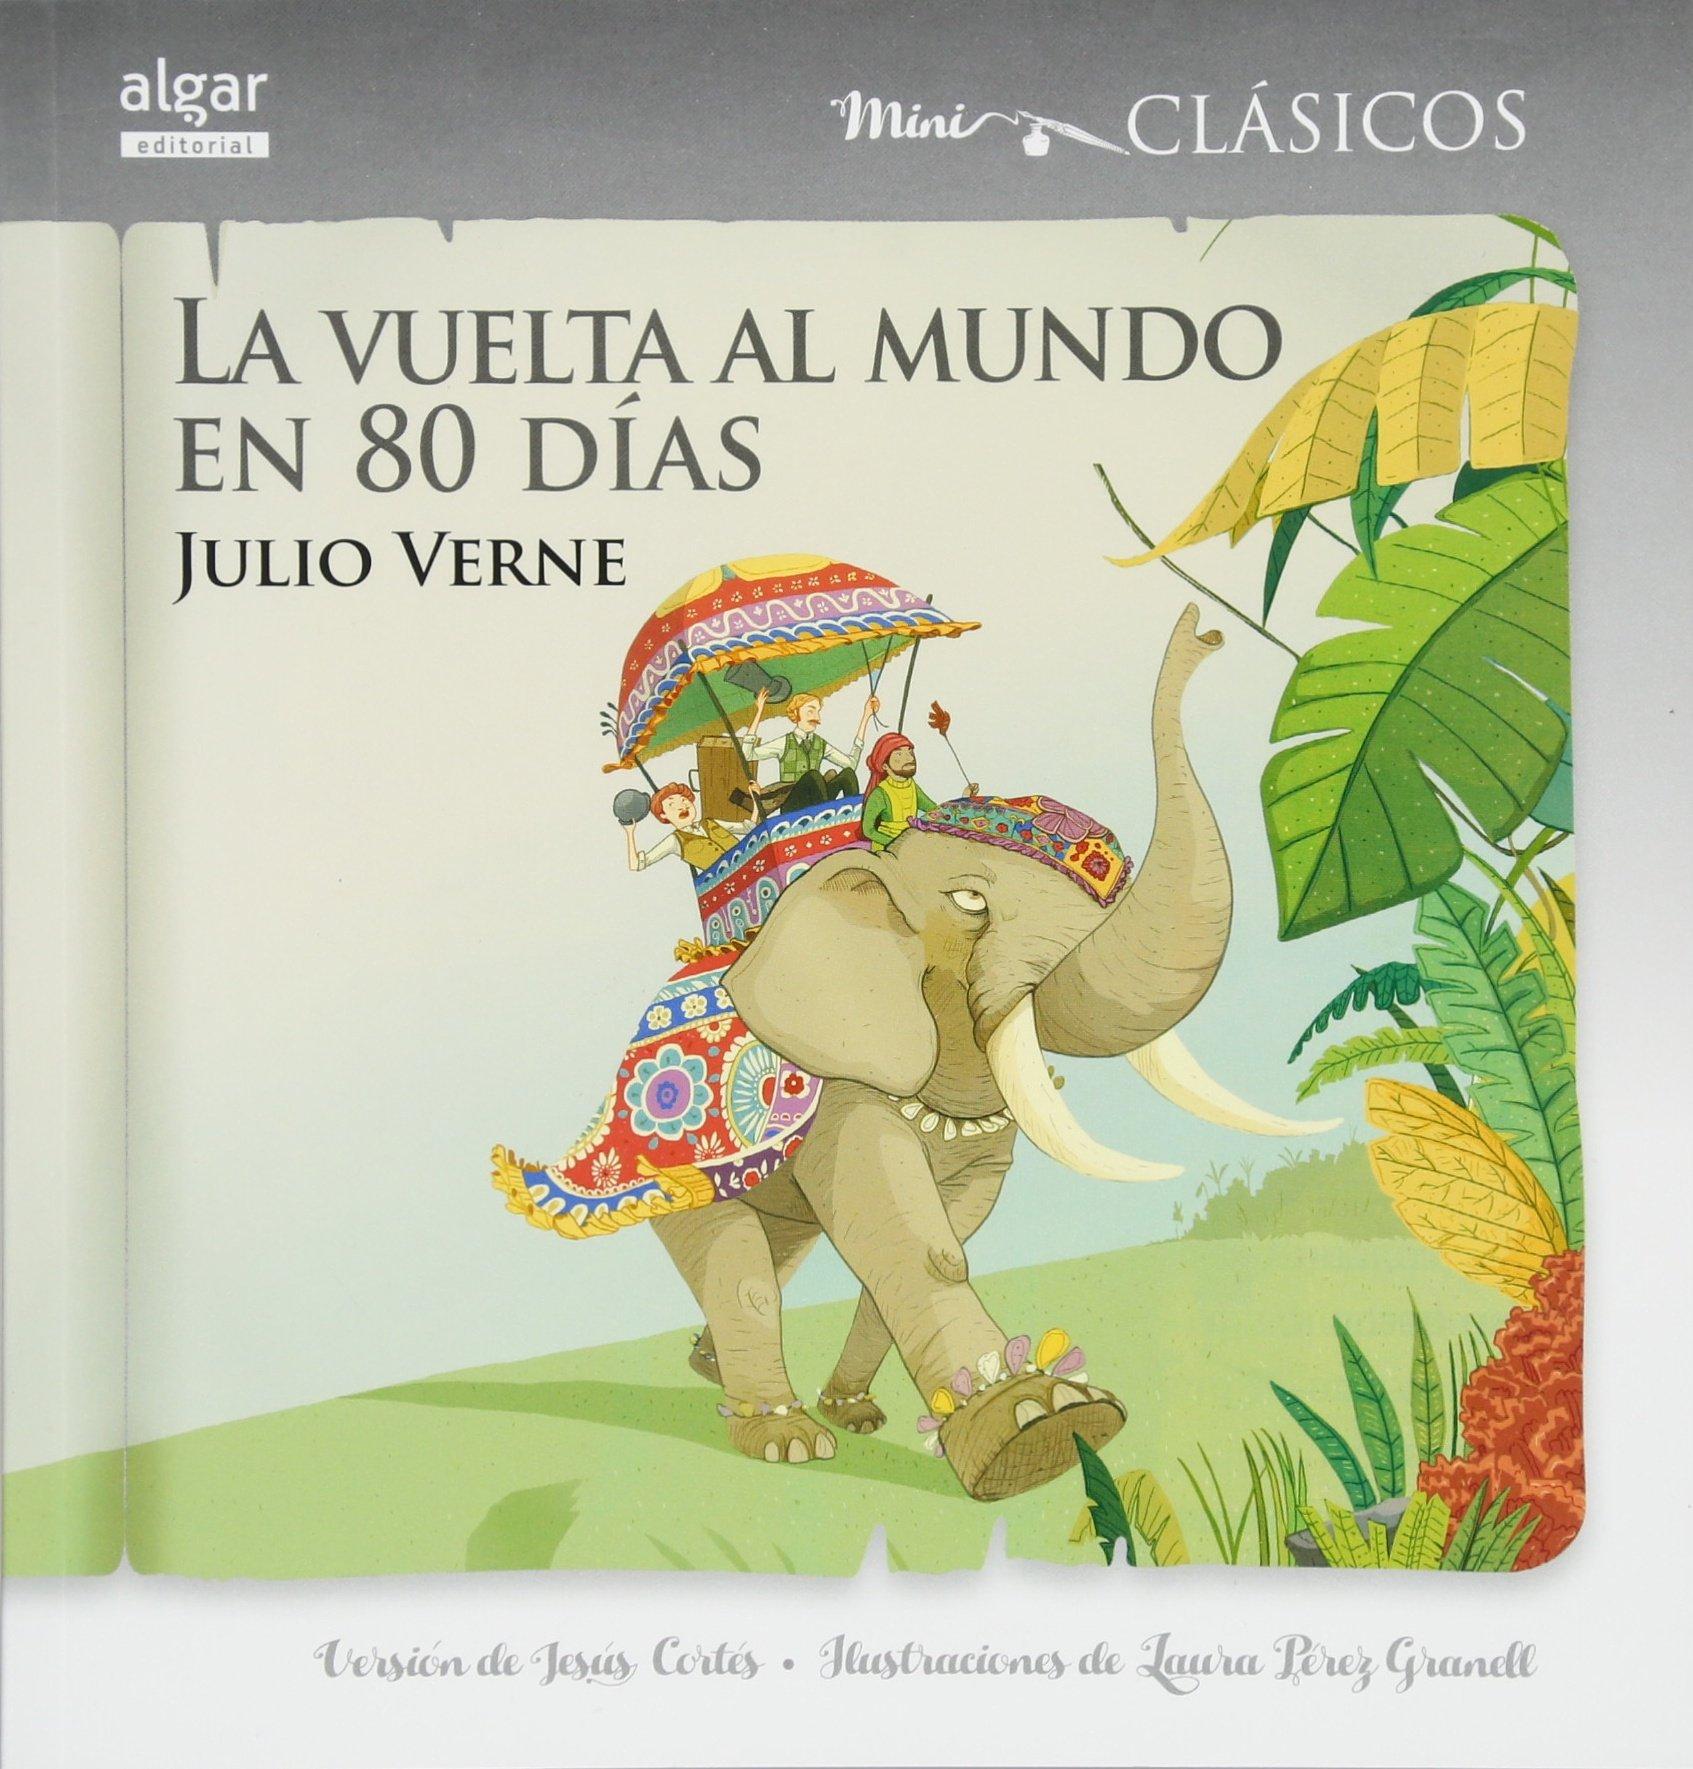 La Vuelta Al Mundo En 80 Dias (Mini-clasicos) (Spanish Edition): Jules Verne, Jesus Cortes: 9788491420309: Amazon.com: Books